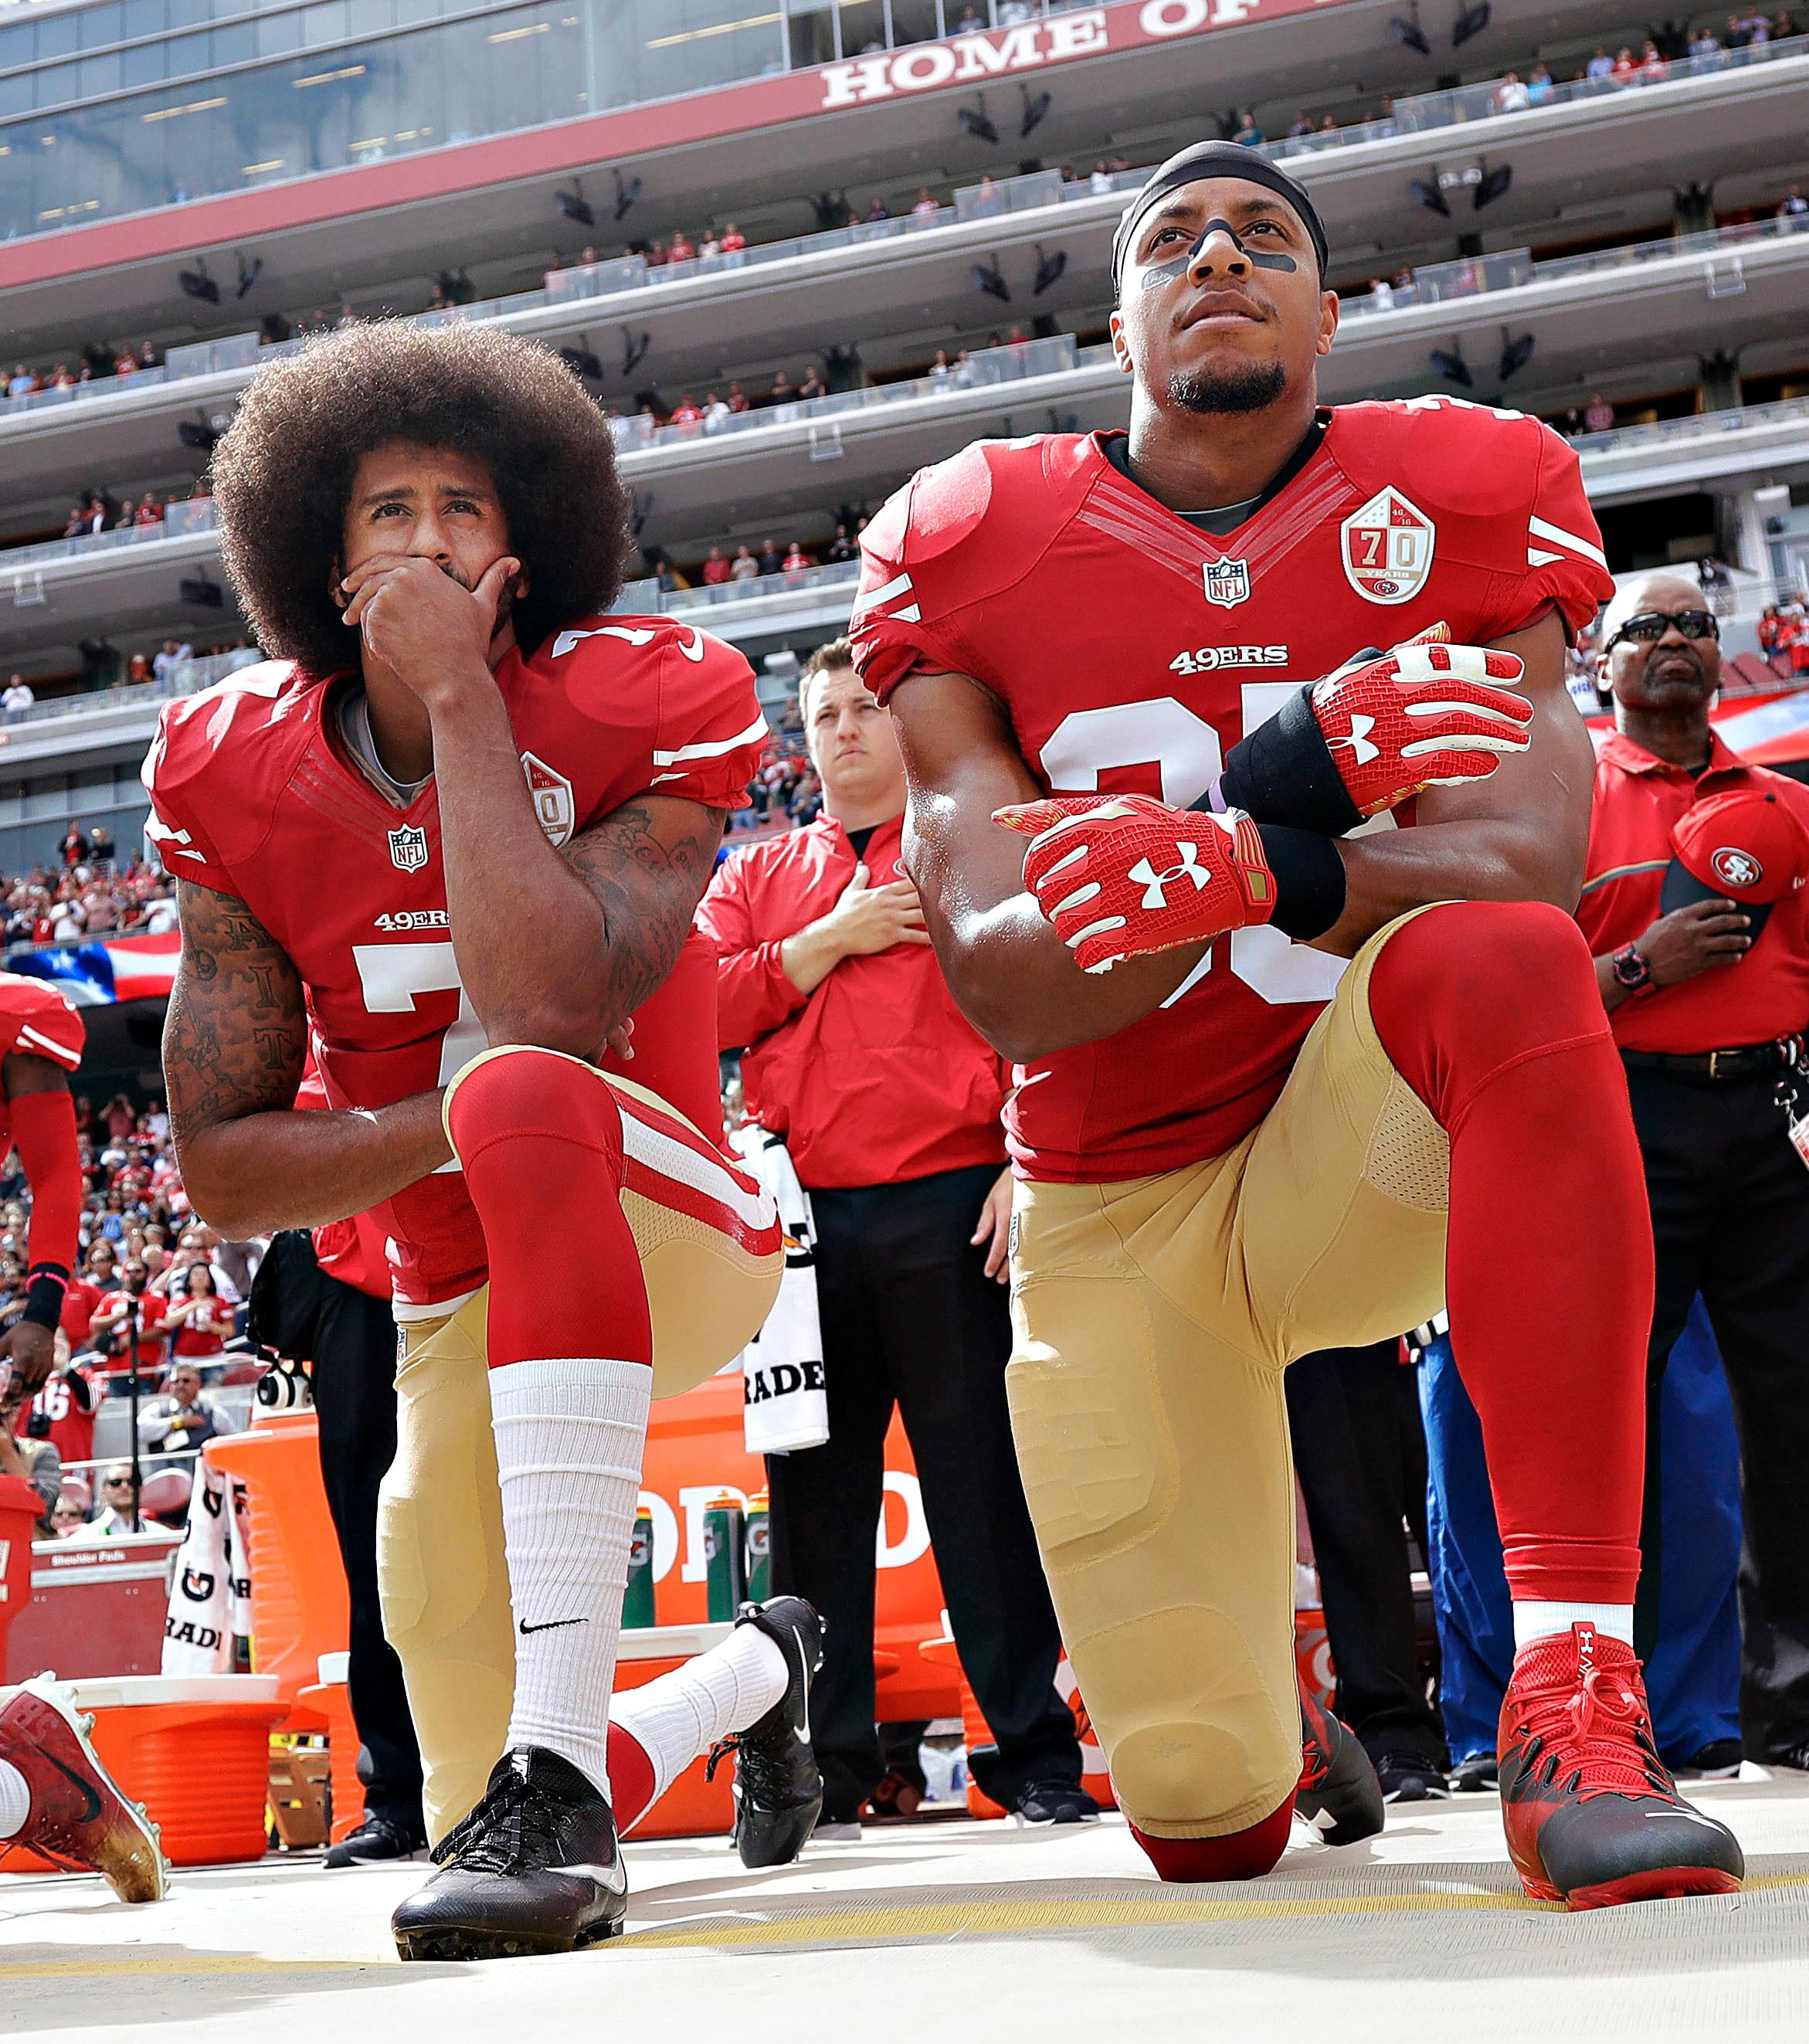 b8f7b2718ca Kaepernick rarely speaks but still dominates every NFL conversation